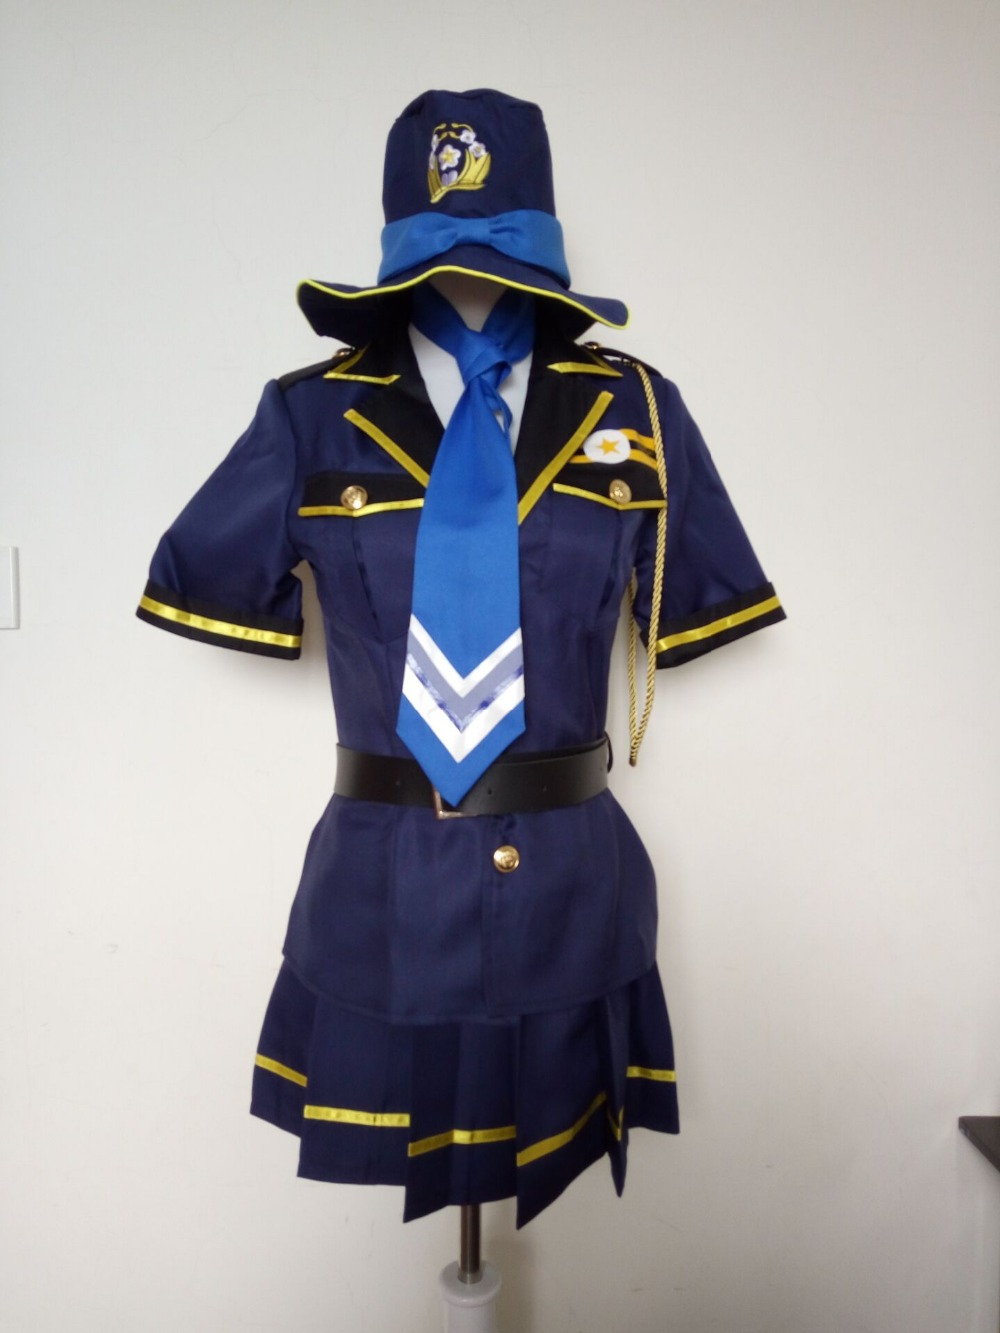 Police cap badges ga rel hat badges page 1 garel - Sonoda Umi Cosplay Costume Police Uniform Ladies Police Cosplay Costumes Tops Skirt